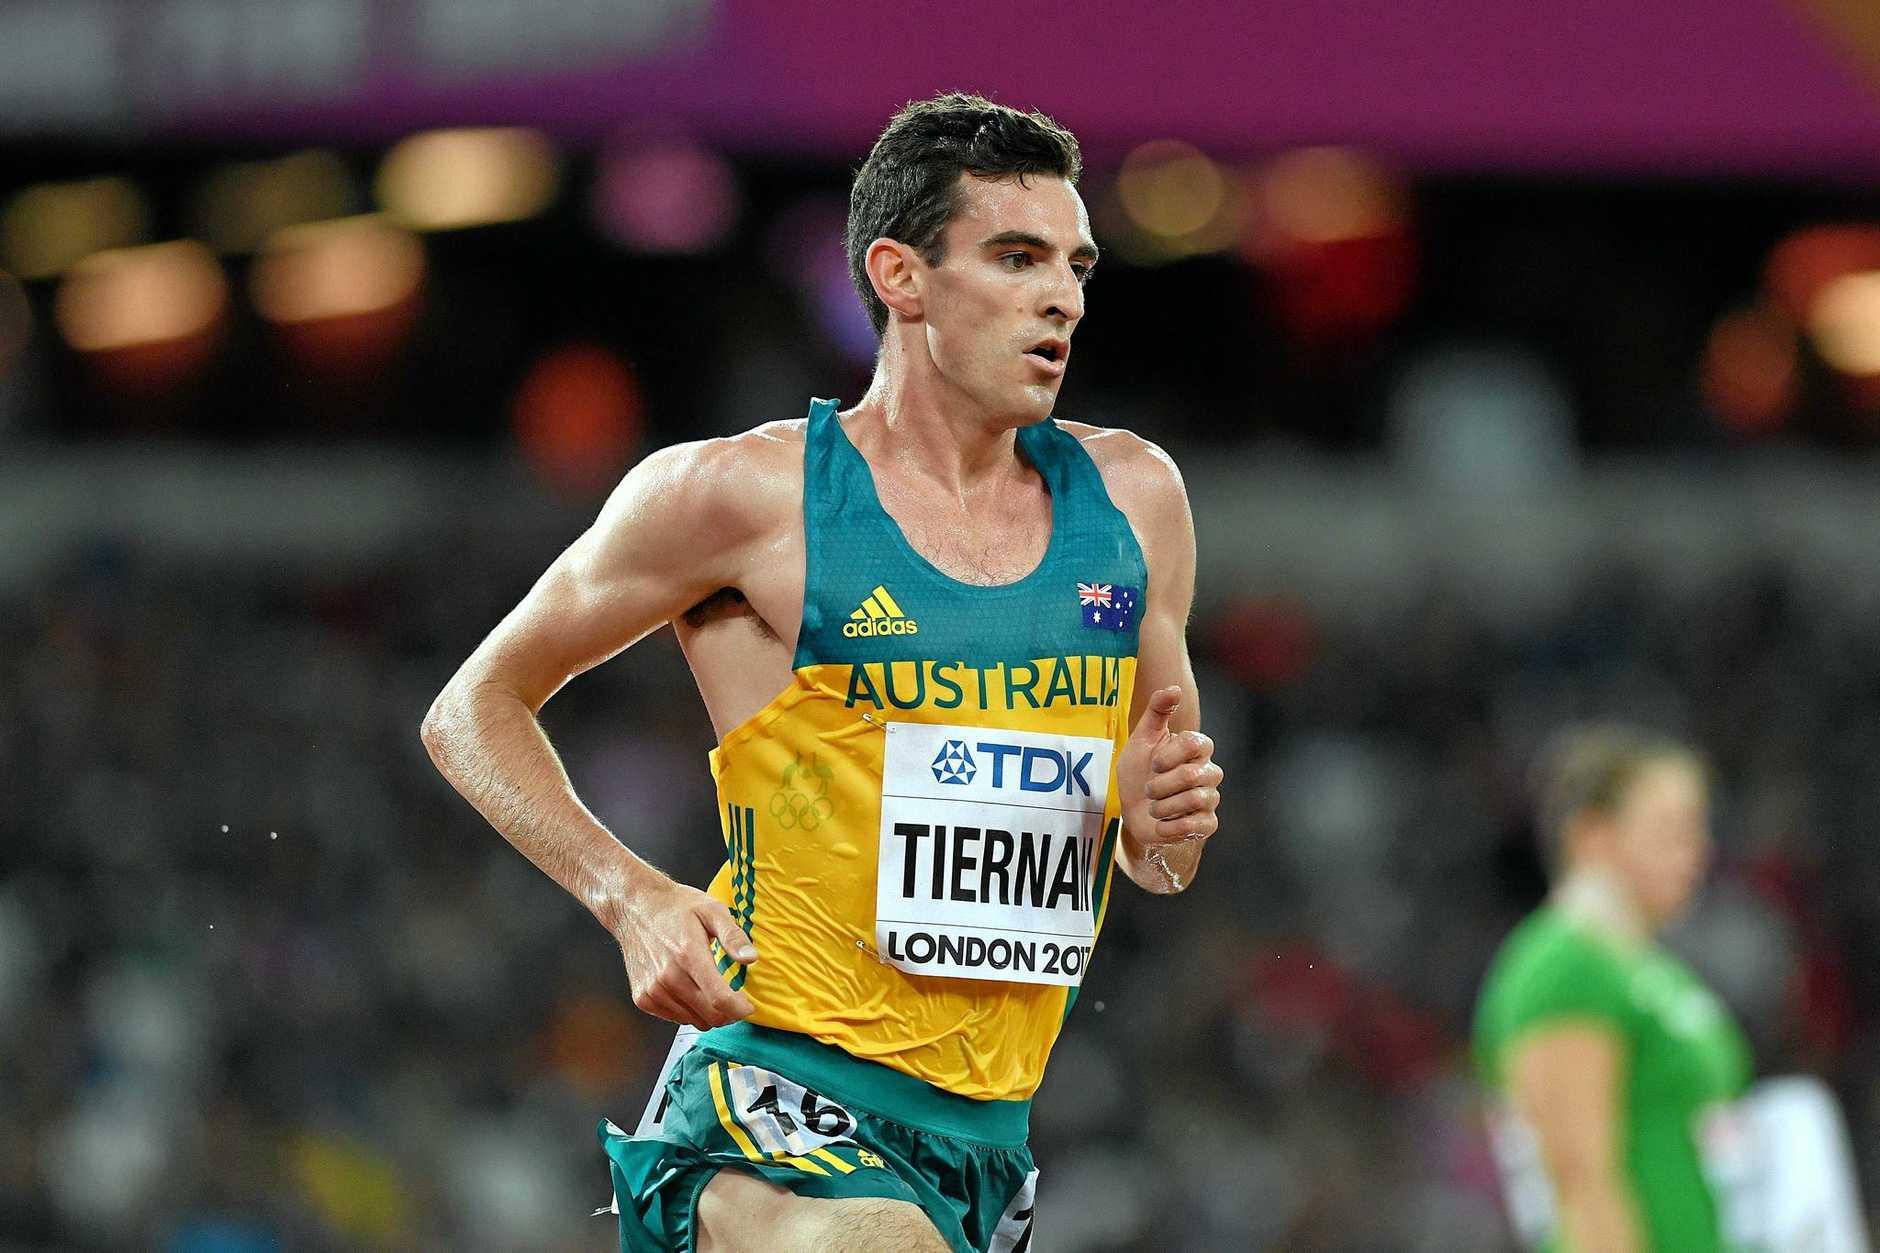 Patrick Tiernan of Australia during heat two of the men's 5000m.